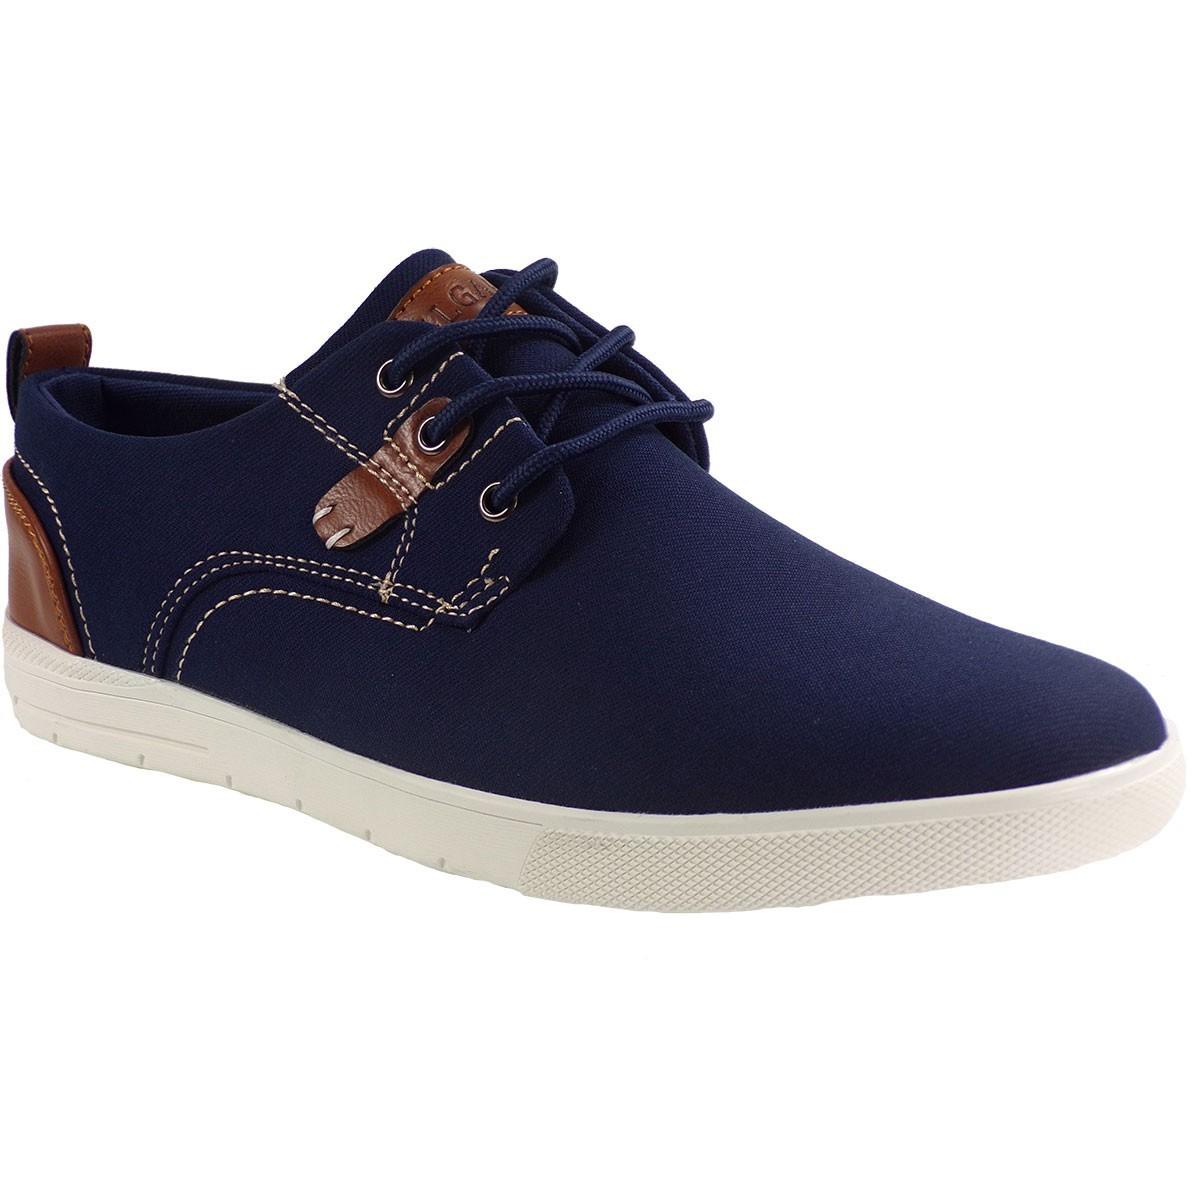 calgary andika papoytsia sneakers 18601 mple tampa gkri www.bagiotashoes.gr (4)